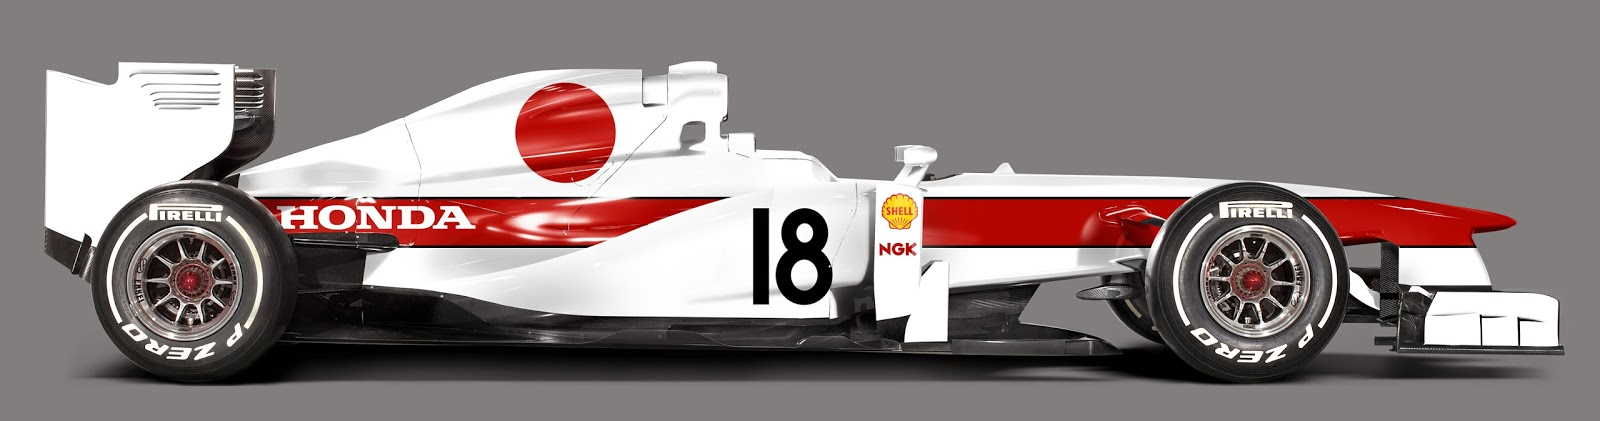 Honda+68.jpg